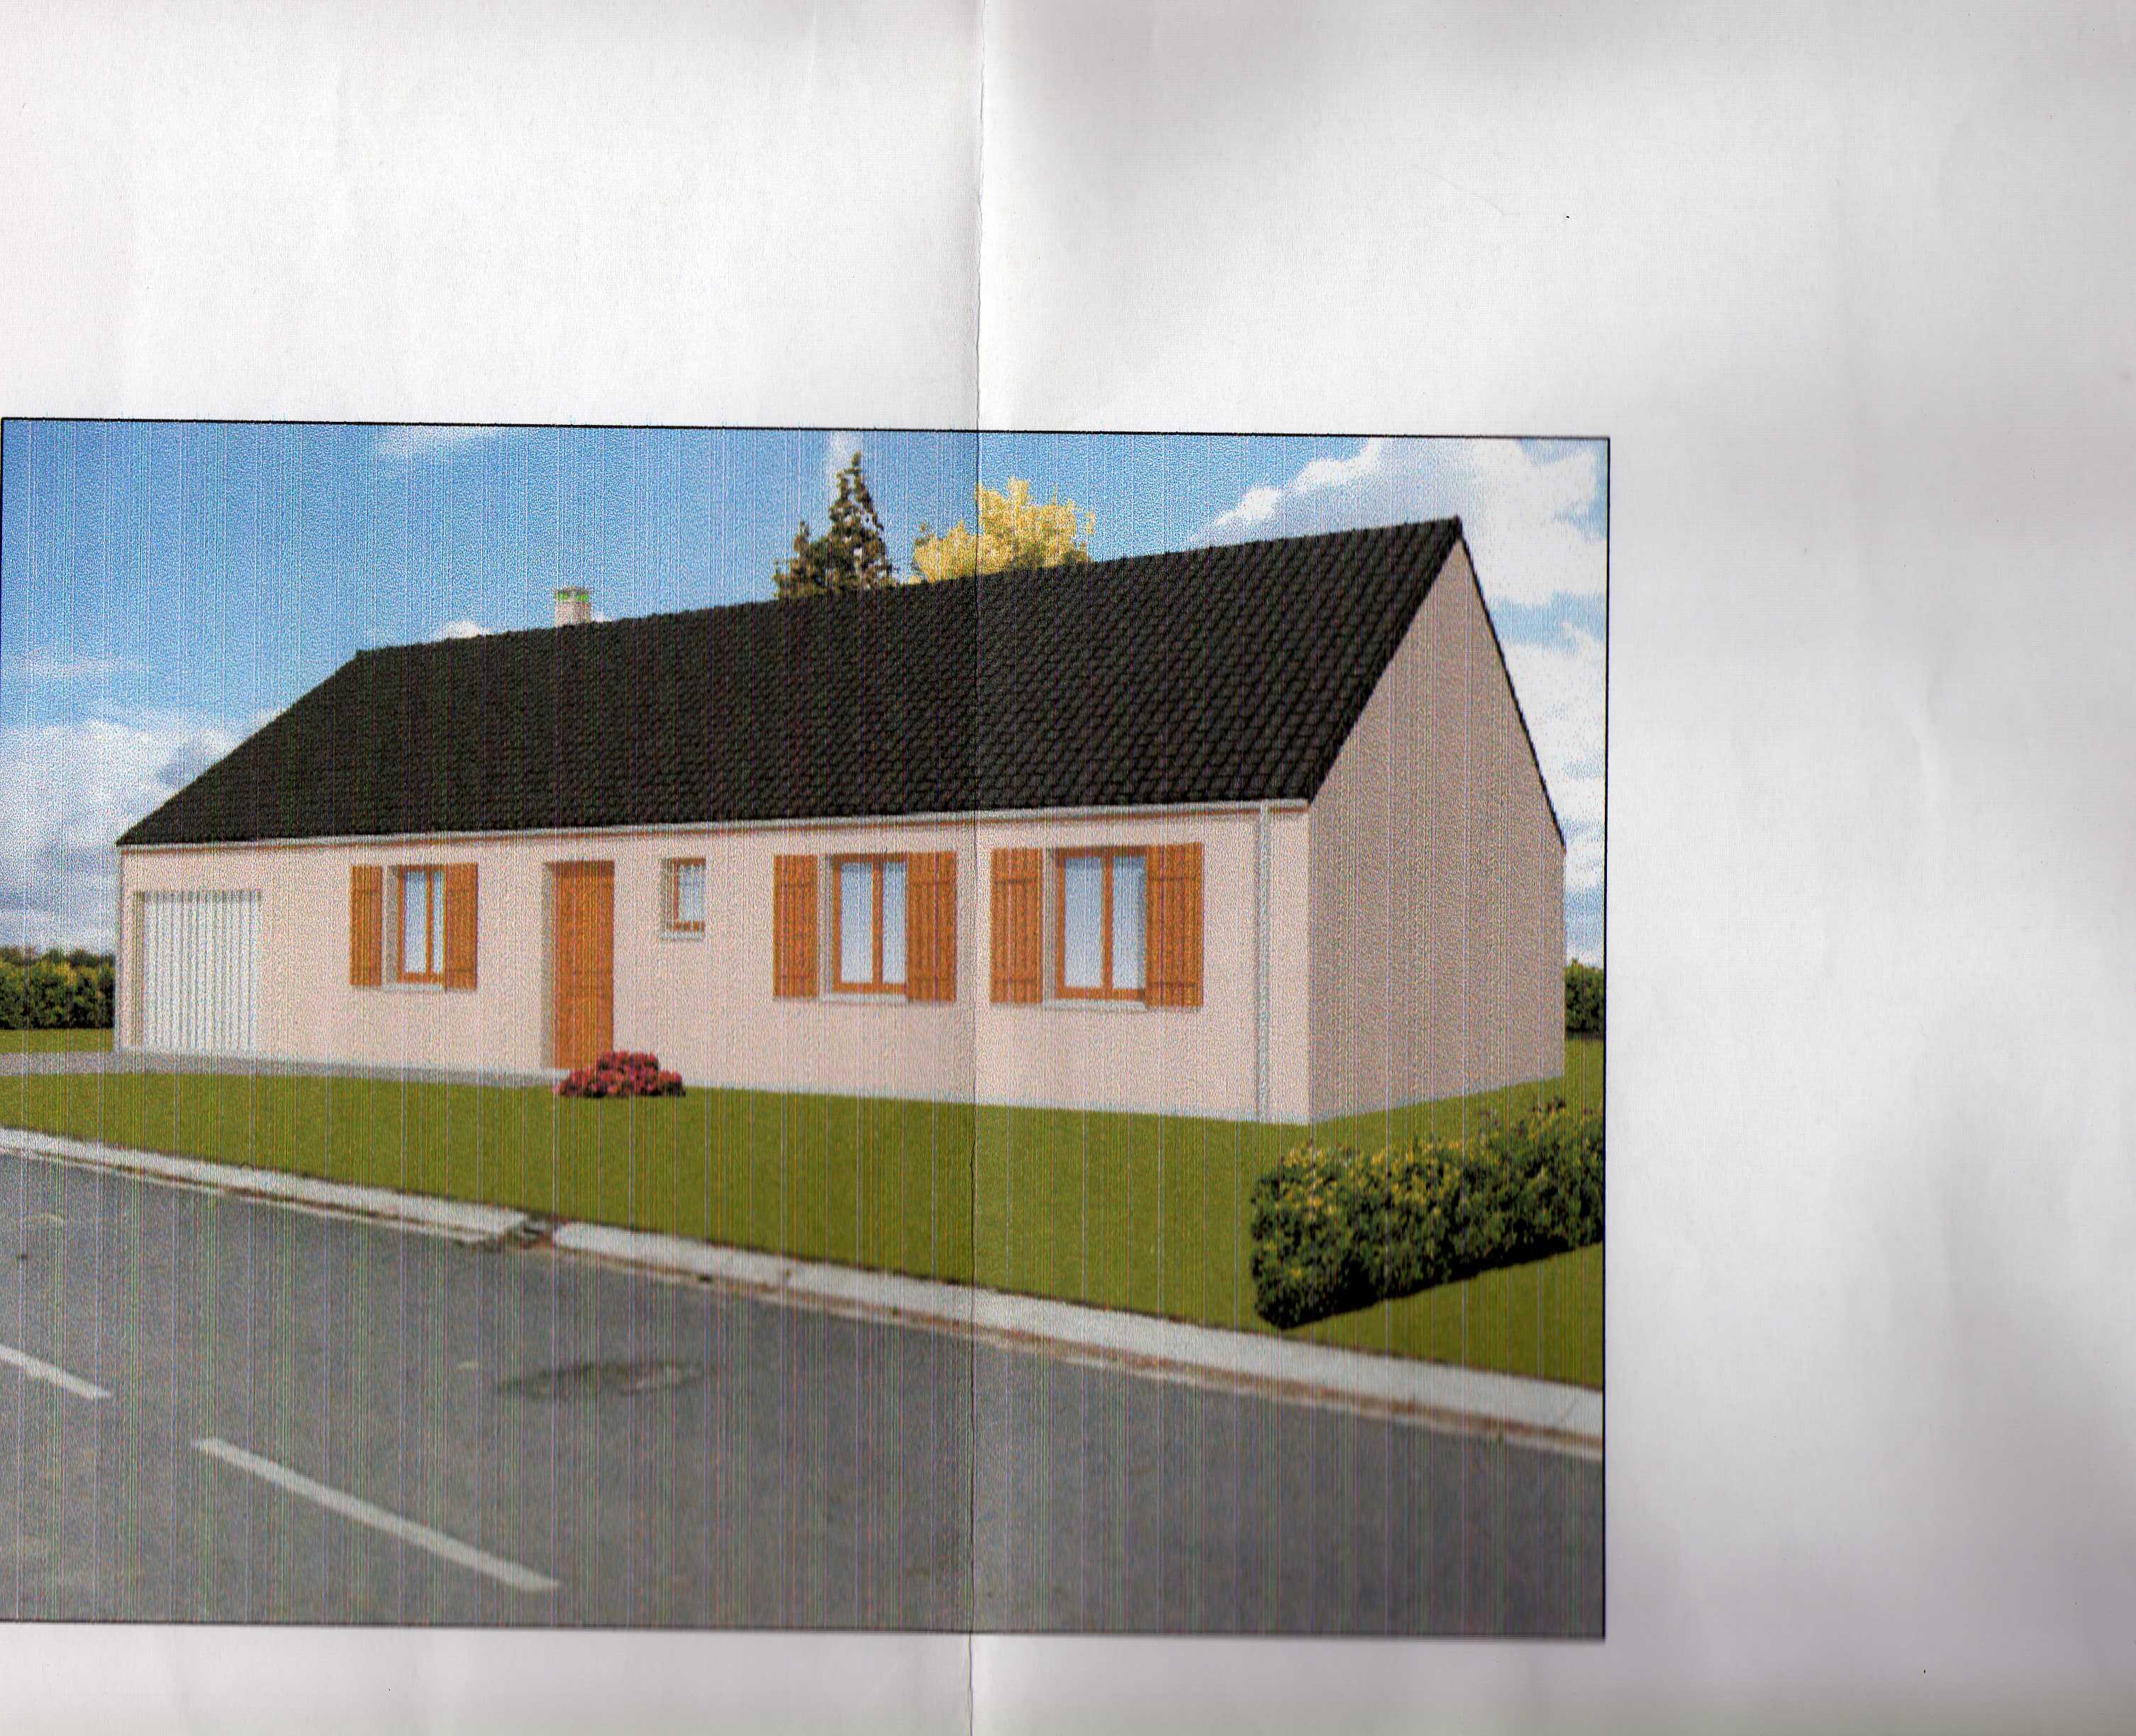 Maison phenix rennes maison moderne for Maison moderne rennes